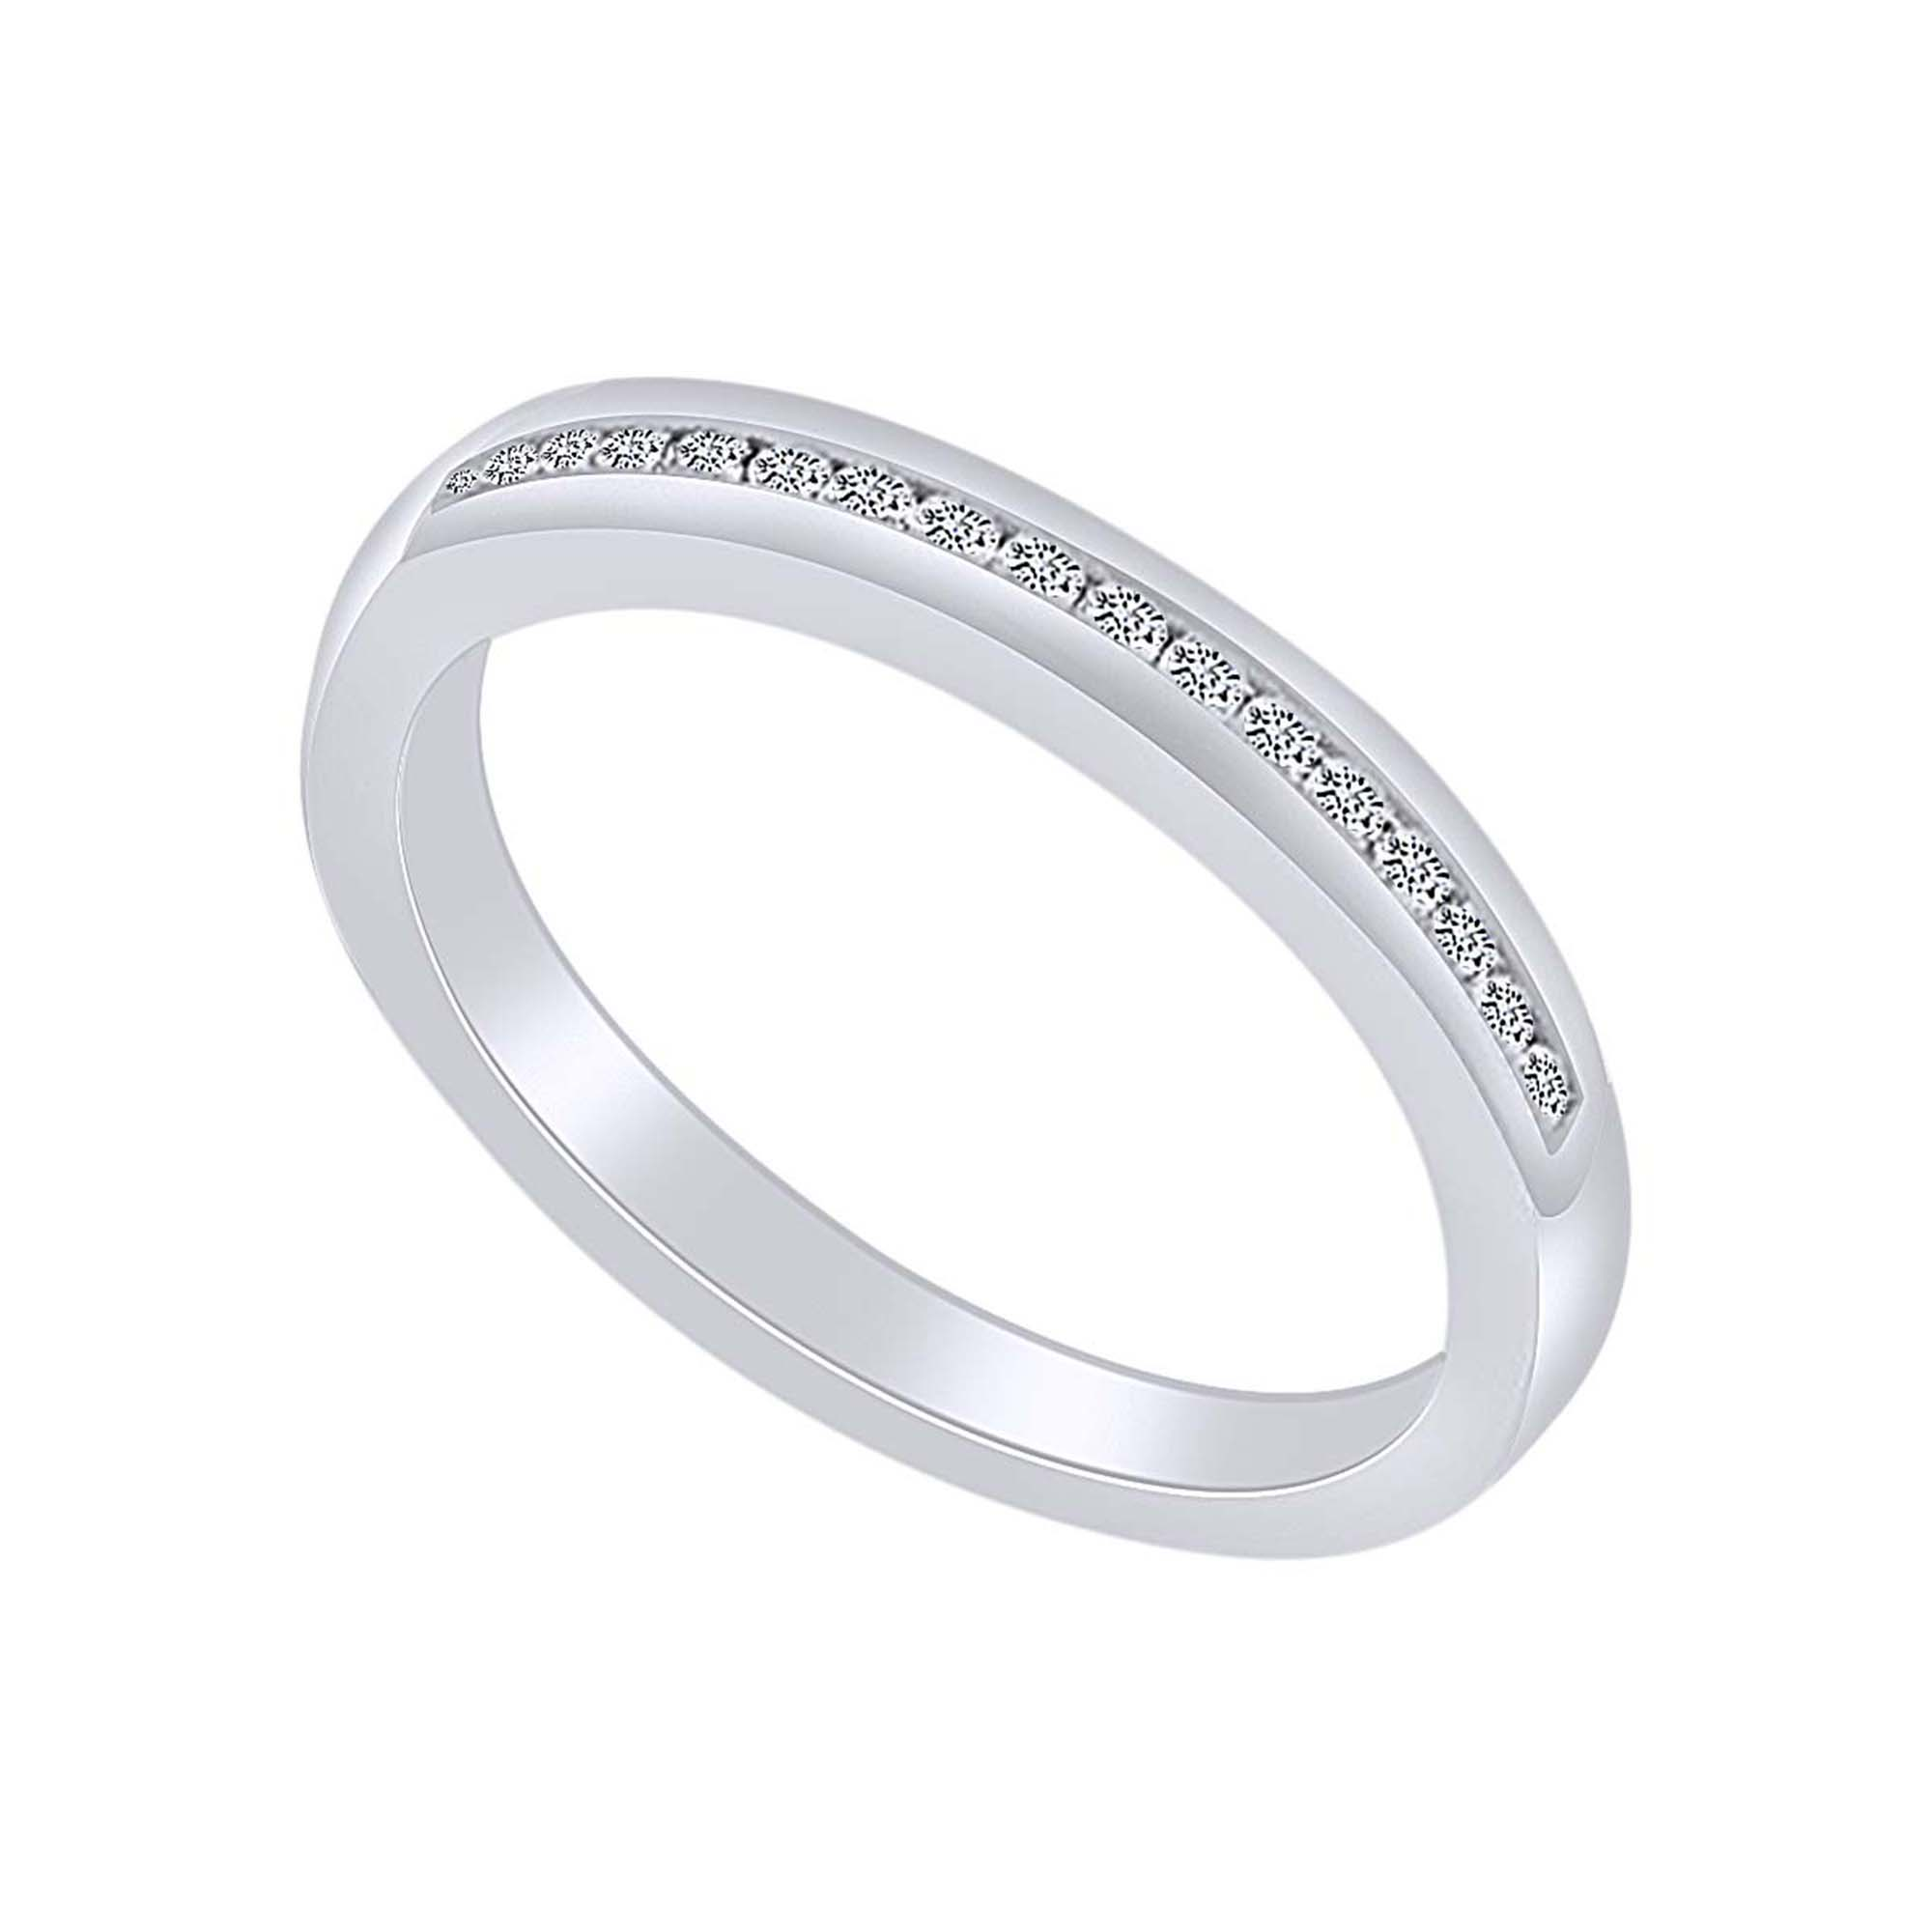 Jewel Zone Us 0 25 Carat Round Shape White Natural Diamond Simple Engagement Ring 14k Solid White Gold Ring Size 11 Walmart Com Walmart Com